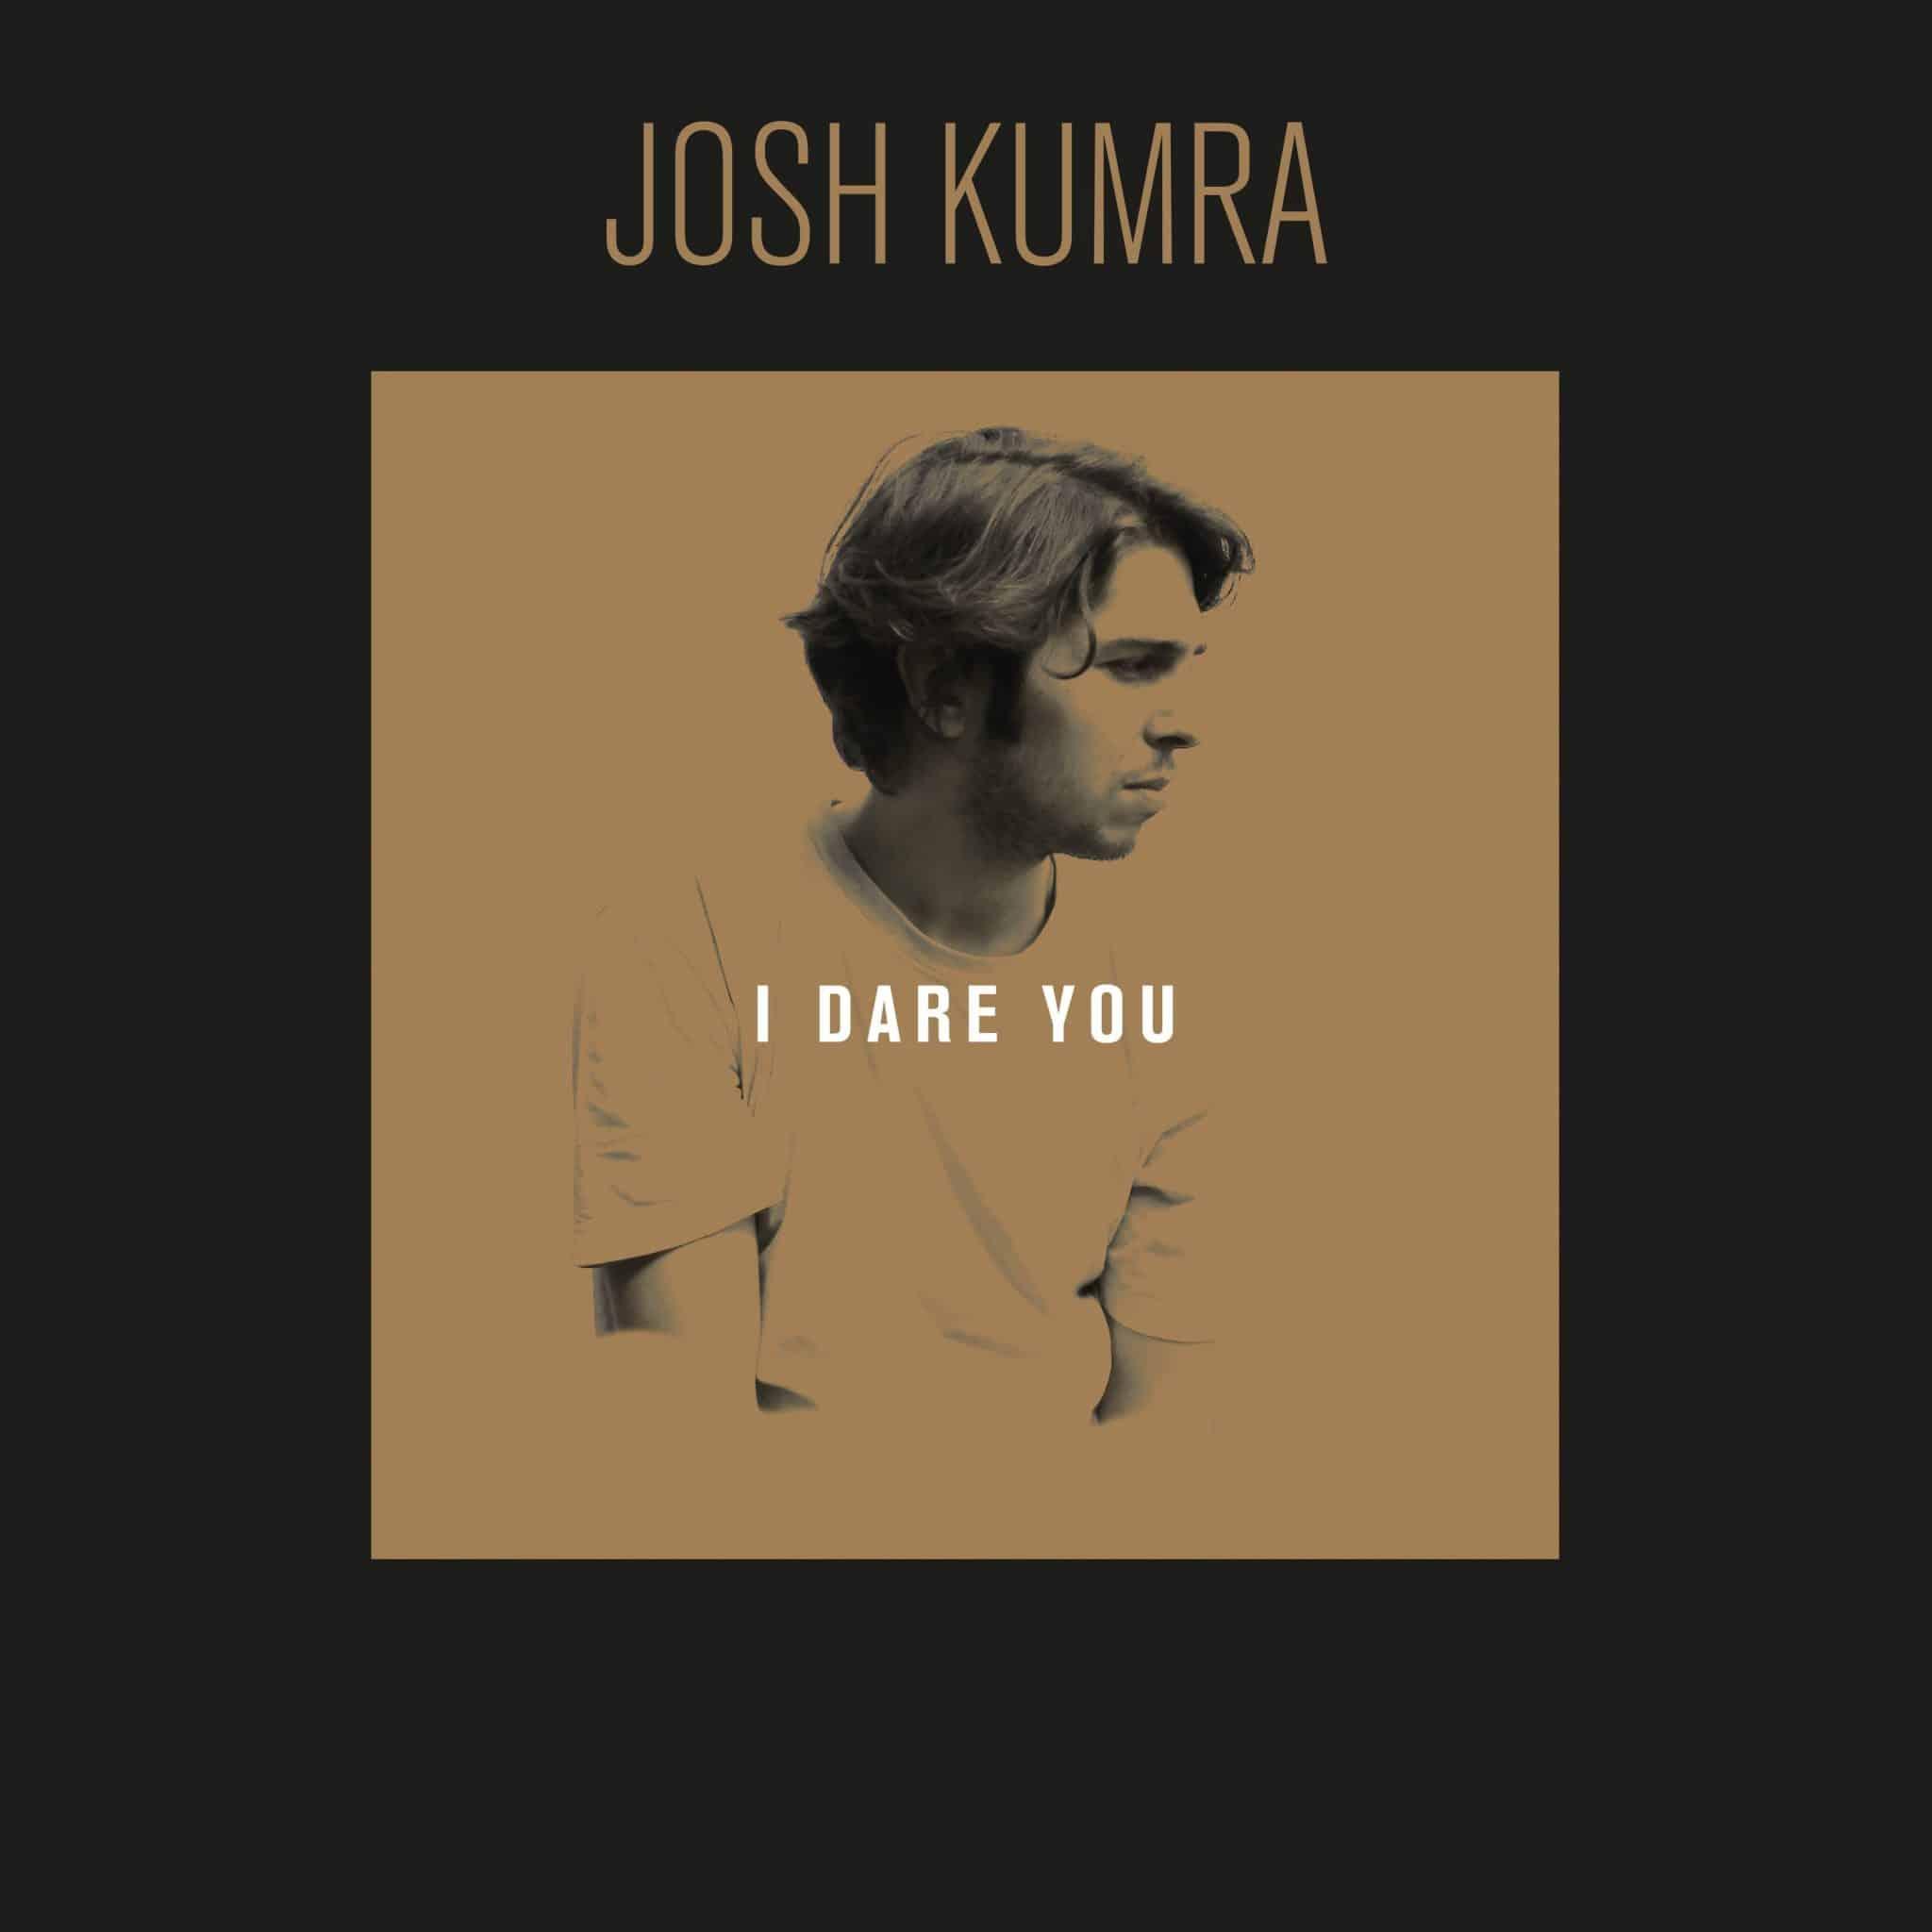 Josh Kumra - I Dare You